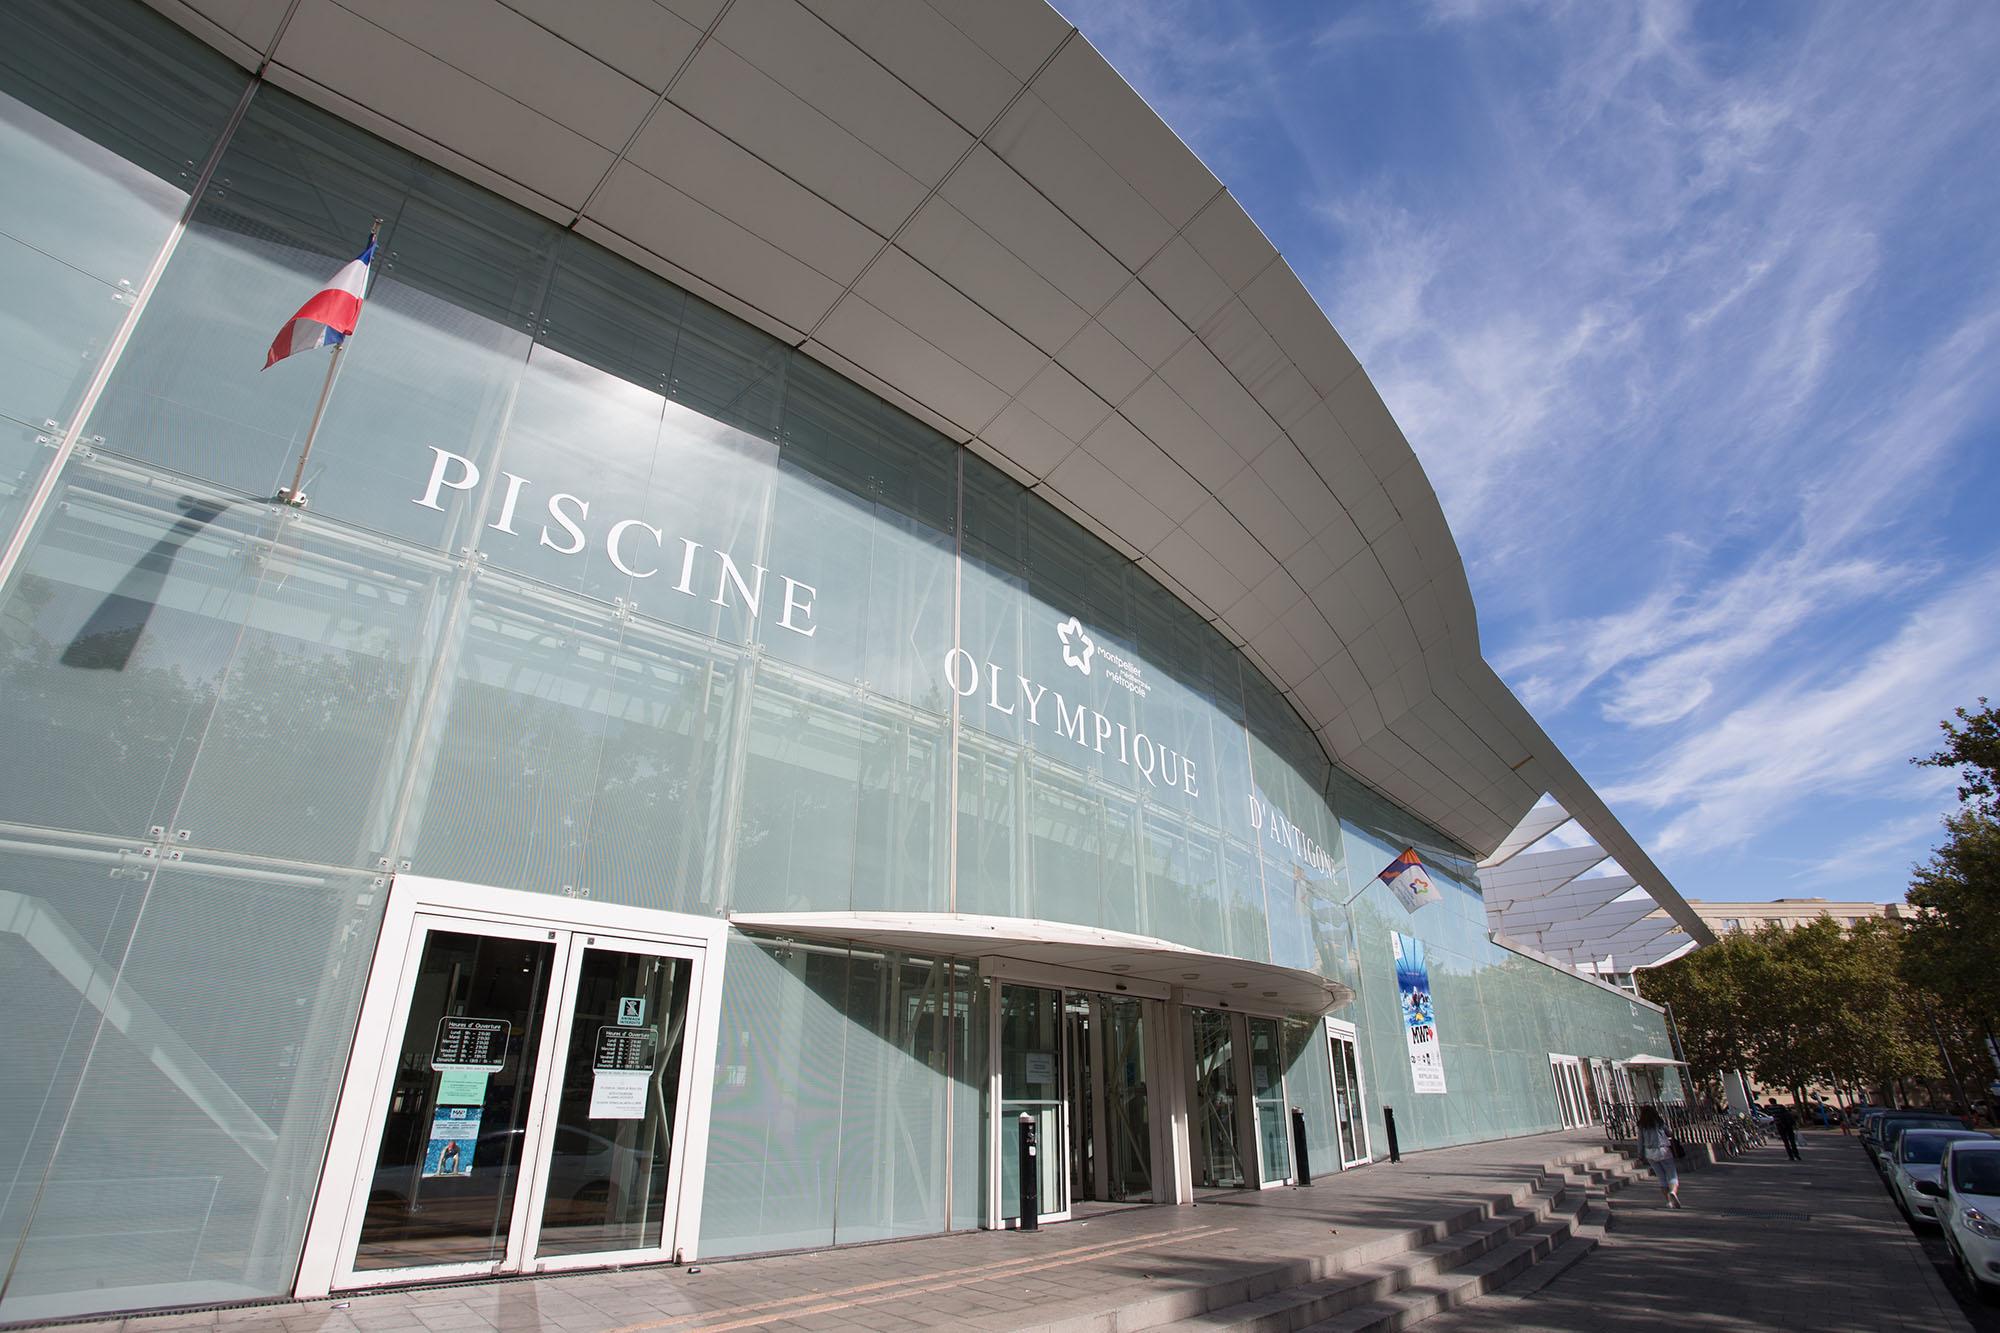 Piscine Olympique d\'Antigone à Montpellier | Montpellier ...